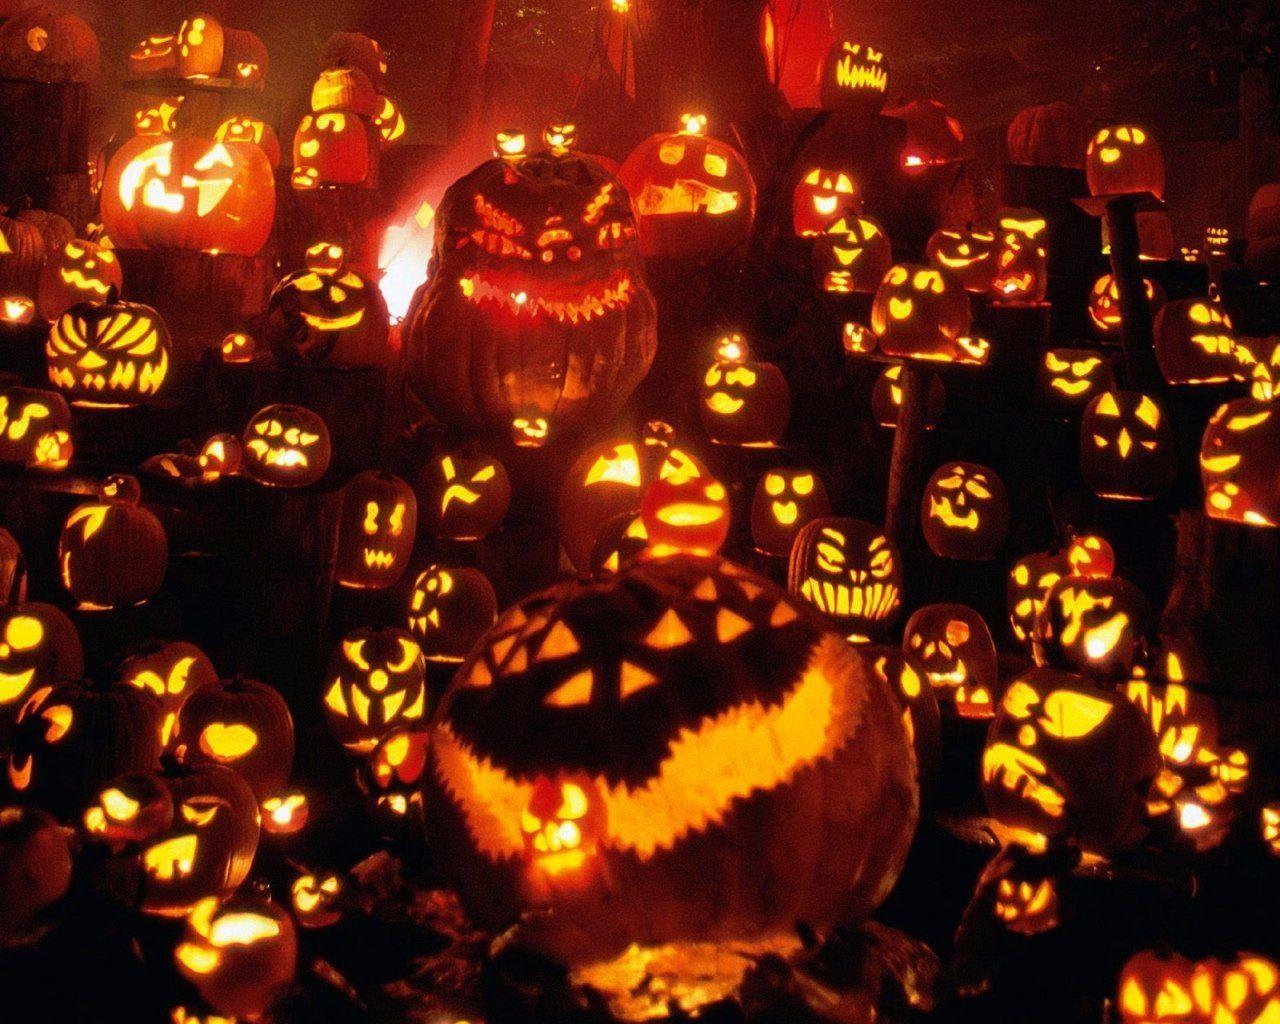 Good Wallpaper Halloween Pinterest - 9afdc54c7998126407a0e03e03c16297  You Should Have_98135.jpg